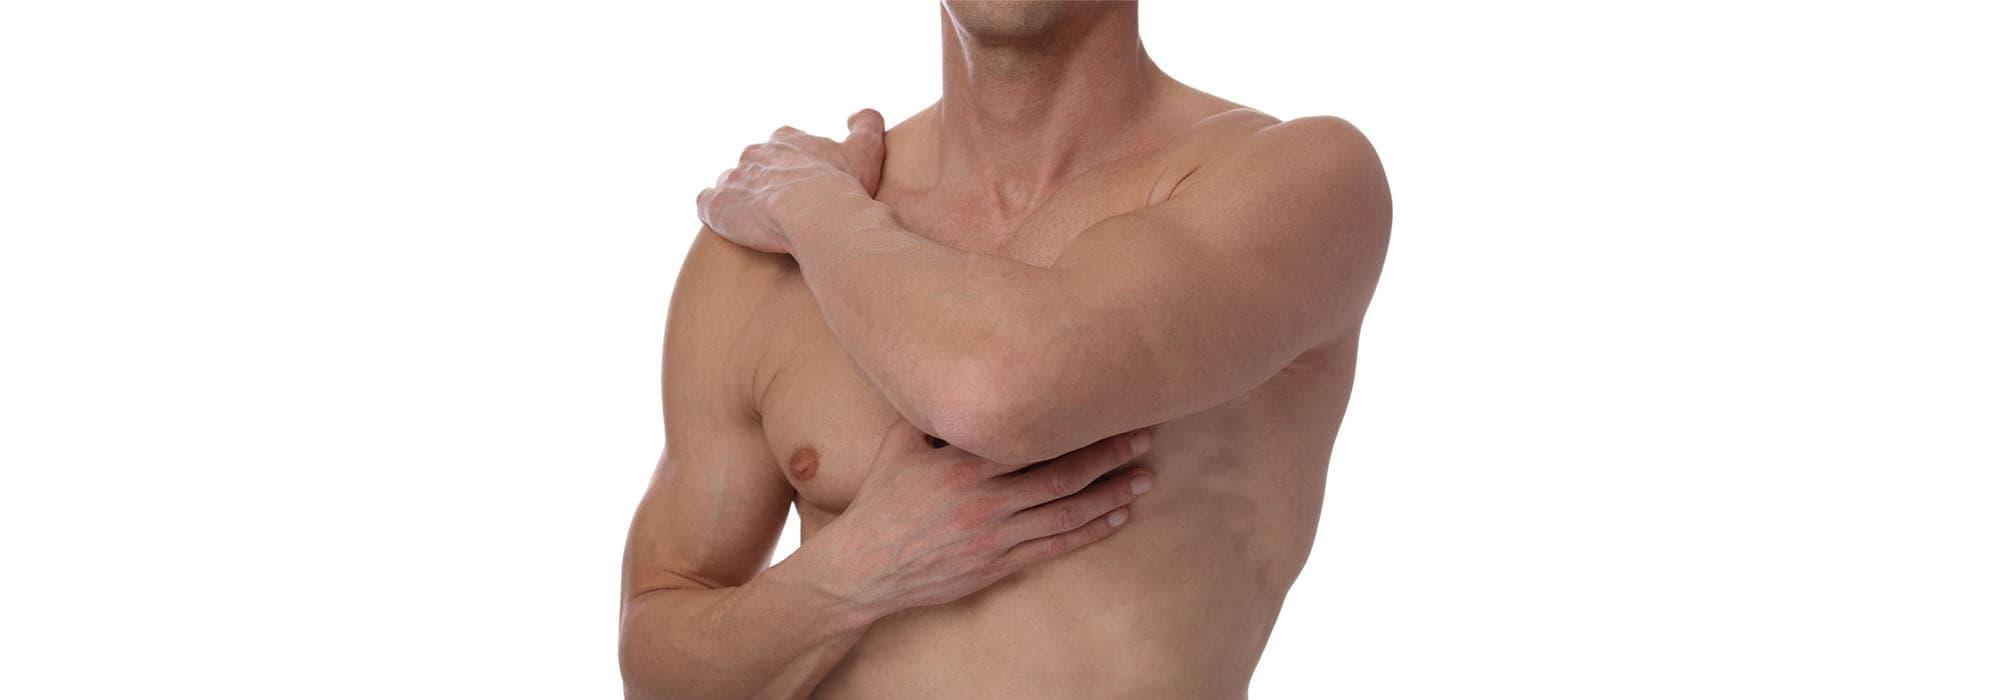 Bei männern brustvergrößerung Gynäkomastie